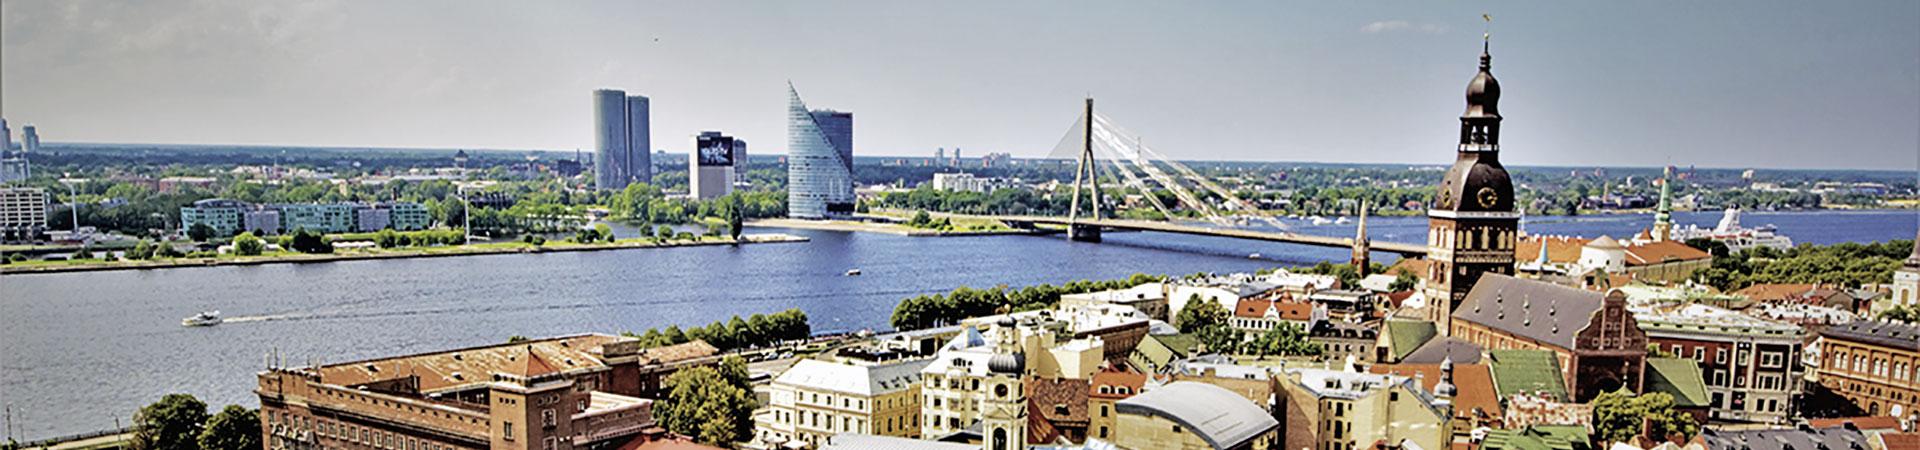 Titelbild-Motorradreise-Baltikum_26-04-2021_192cb